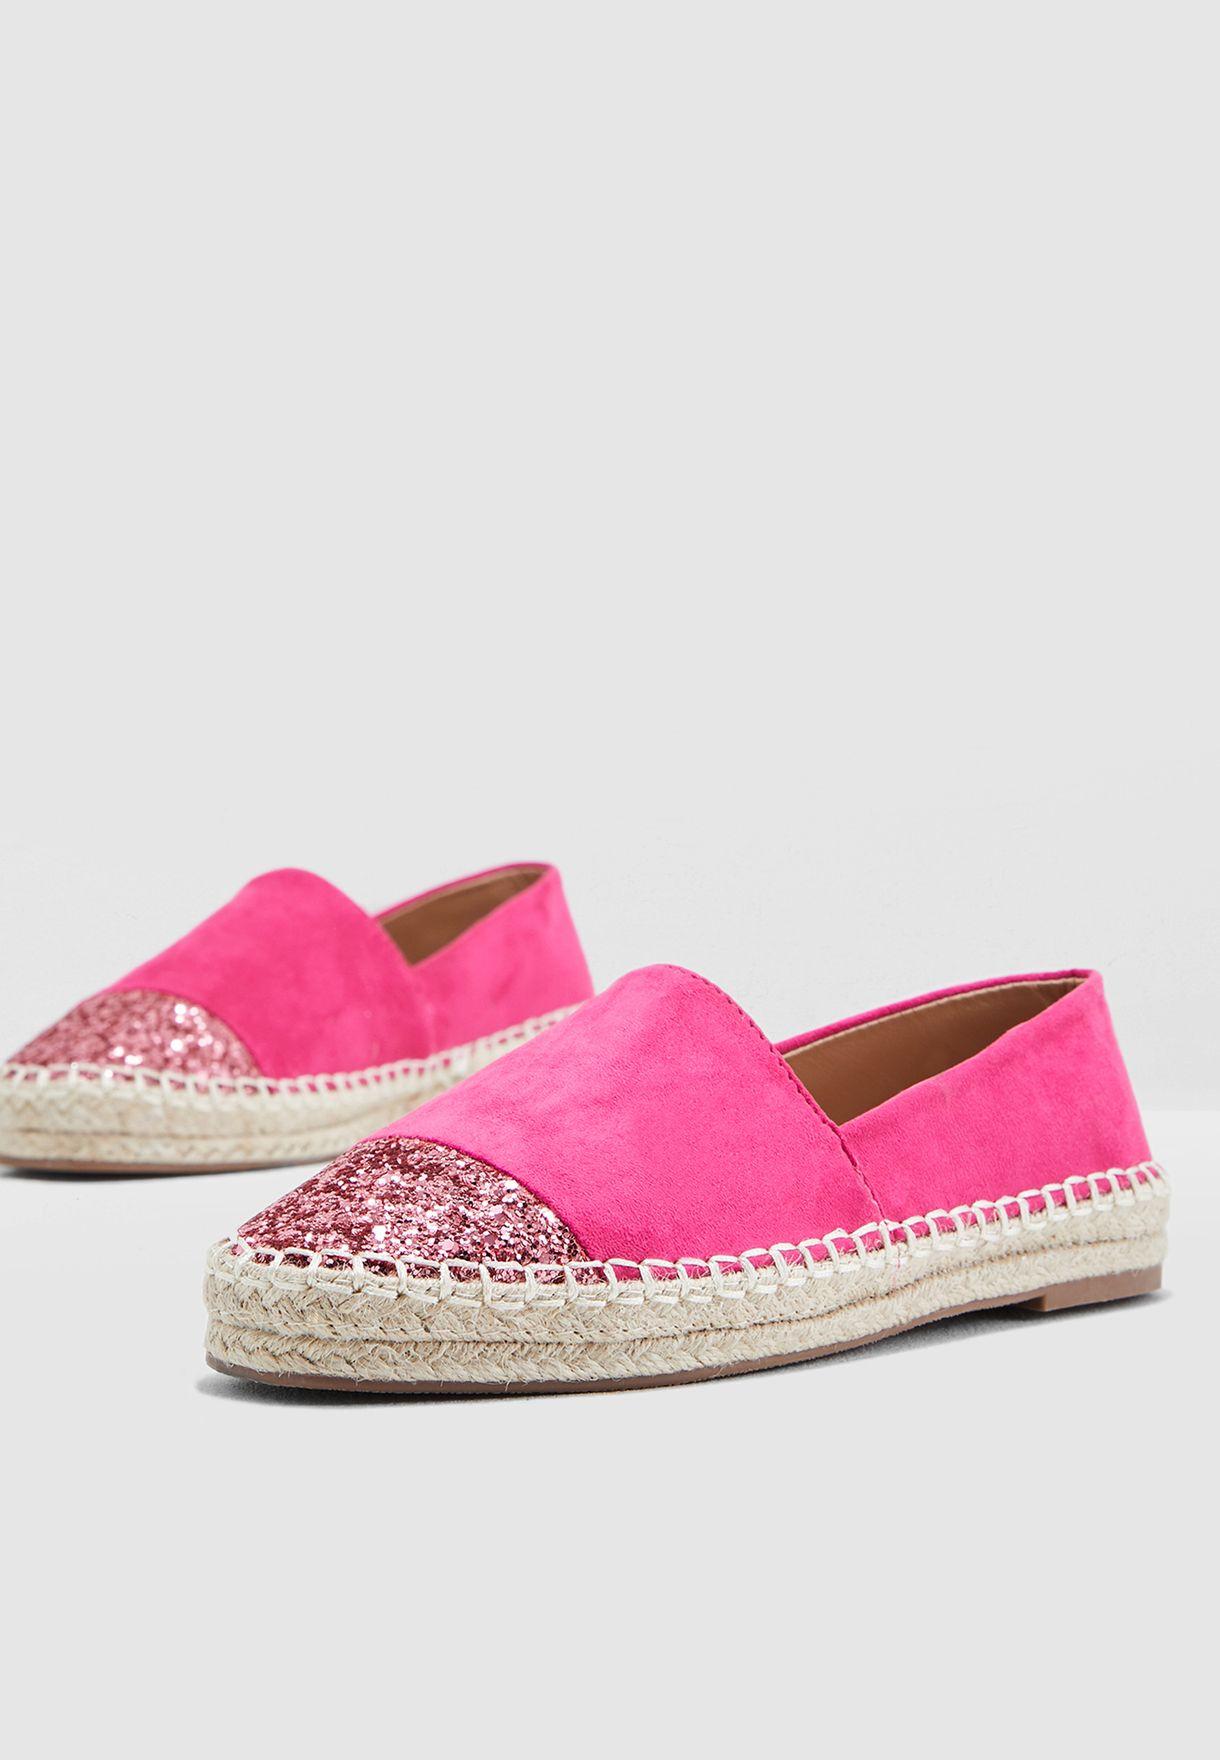 9e6150bf0ab Espadrilles With Glitter Toe